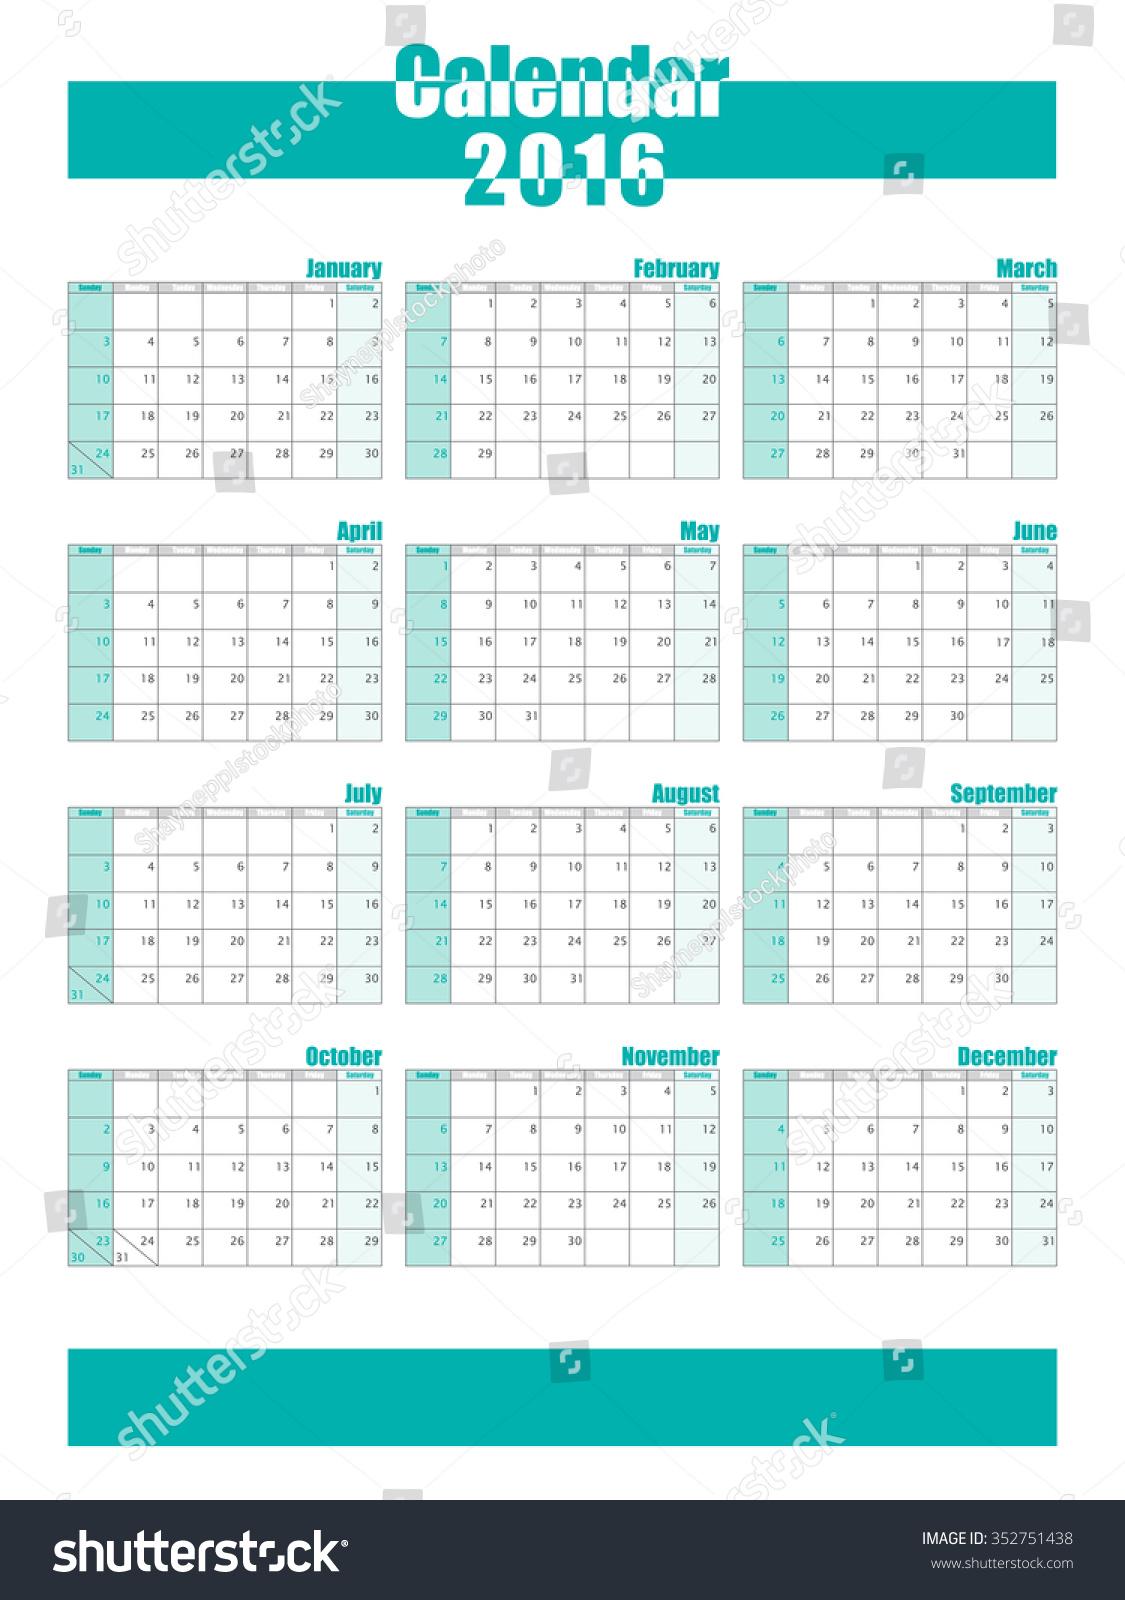 Calendar Template Vector : Calendar template vector shutterstock